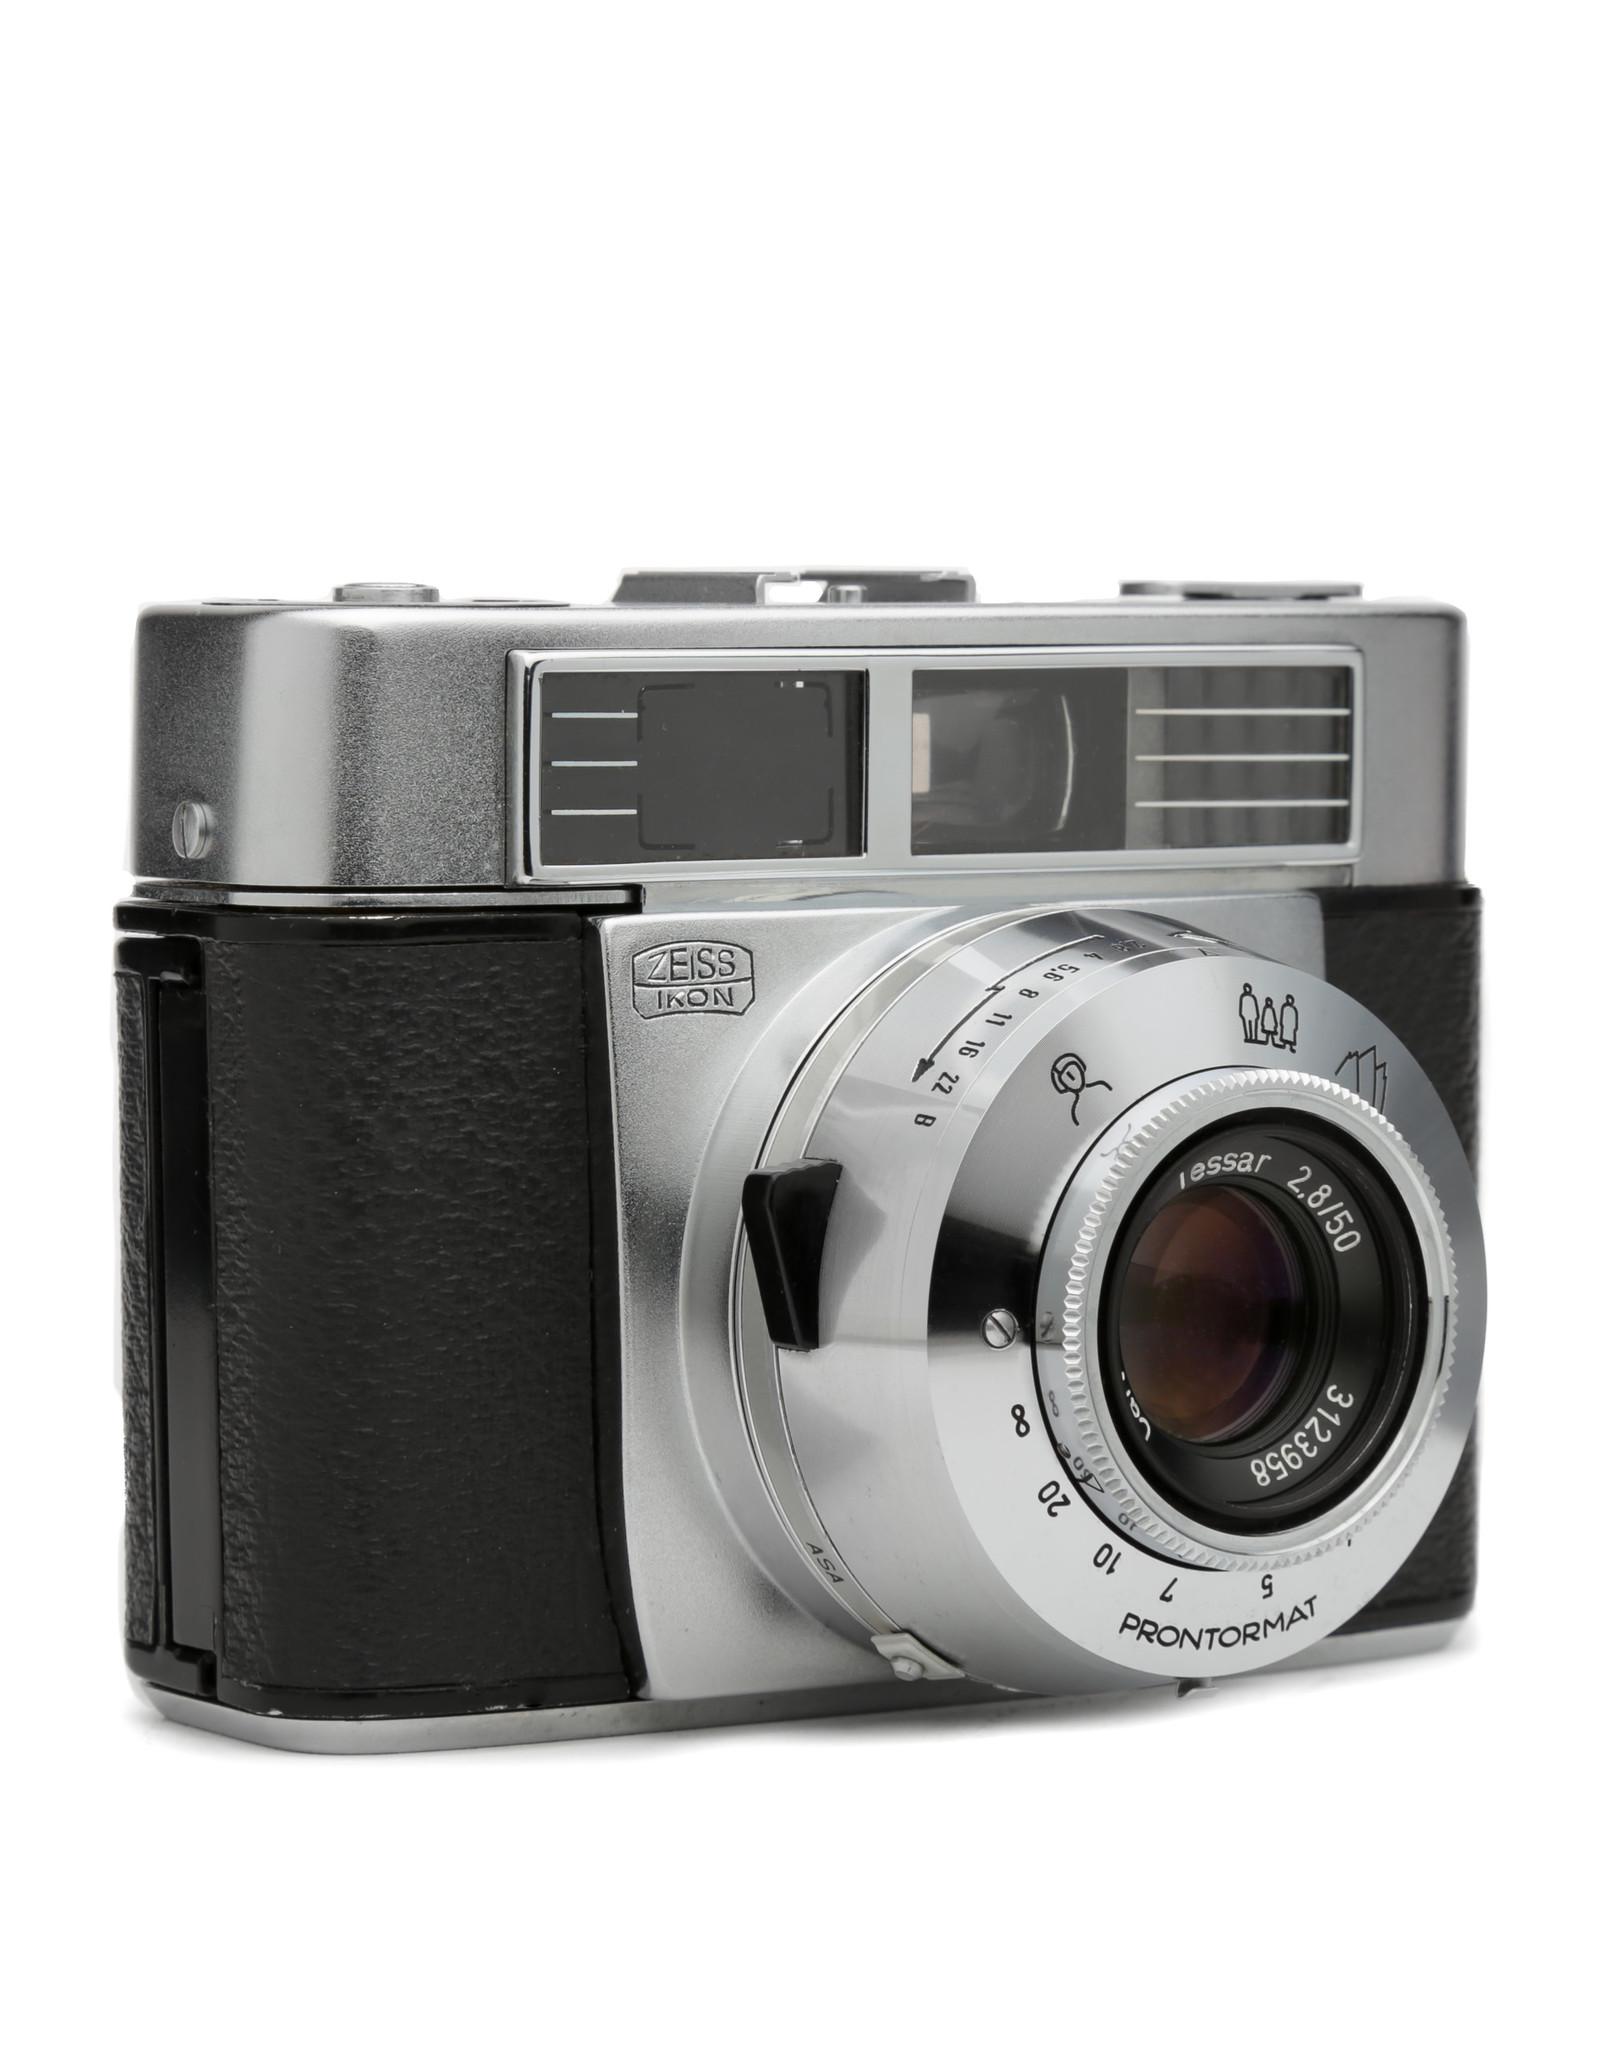 Zeiss Zeiss Ikon Symbolica 35mm Camera w/Tessar 50mm 2.8